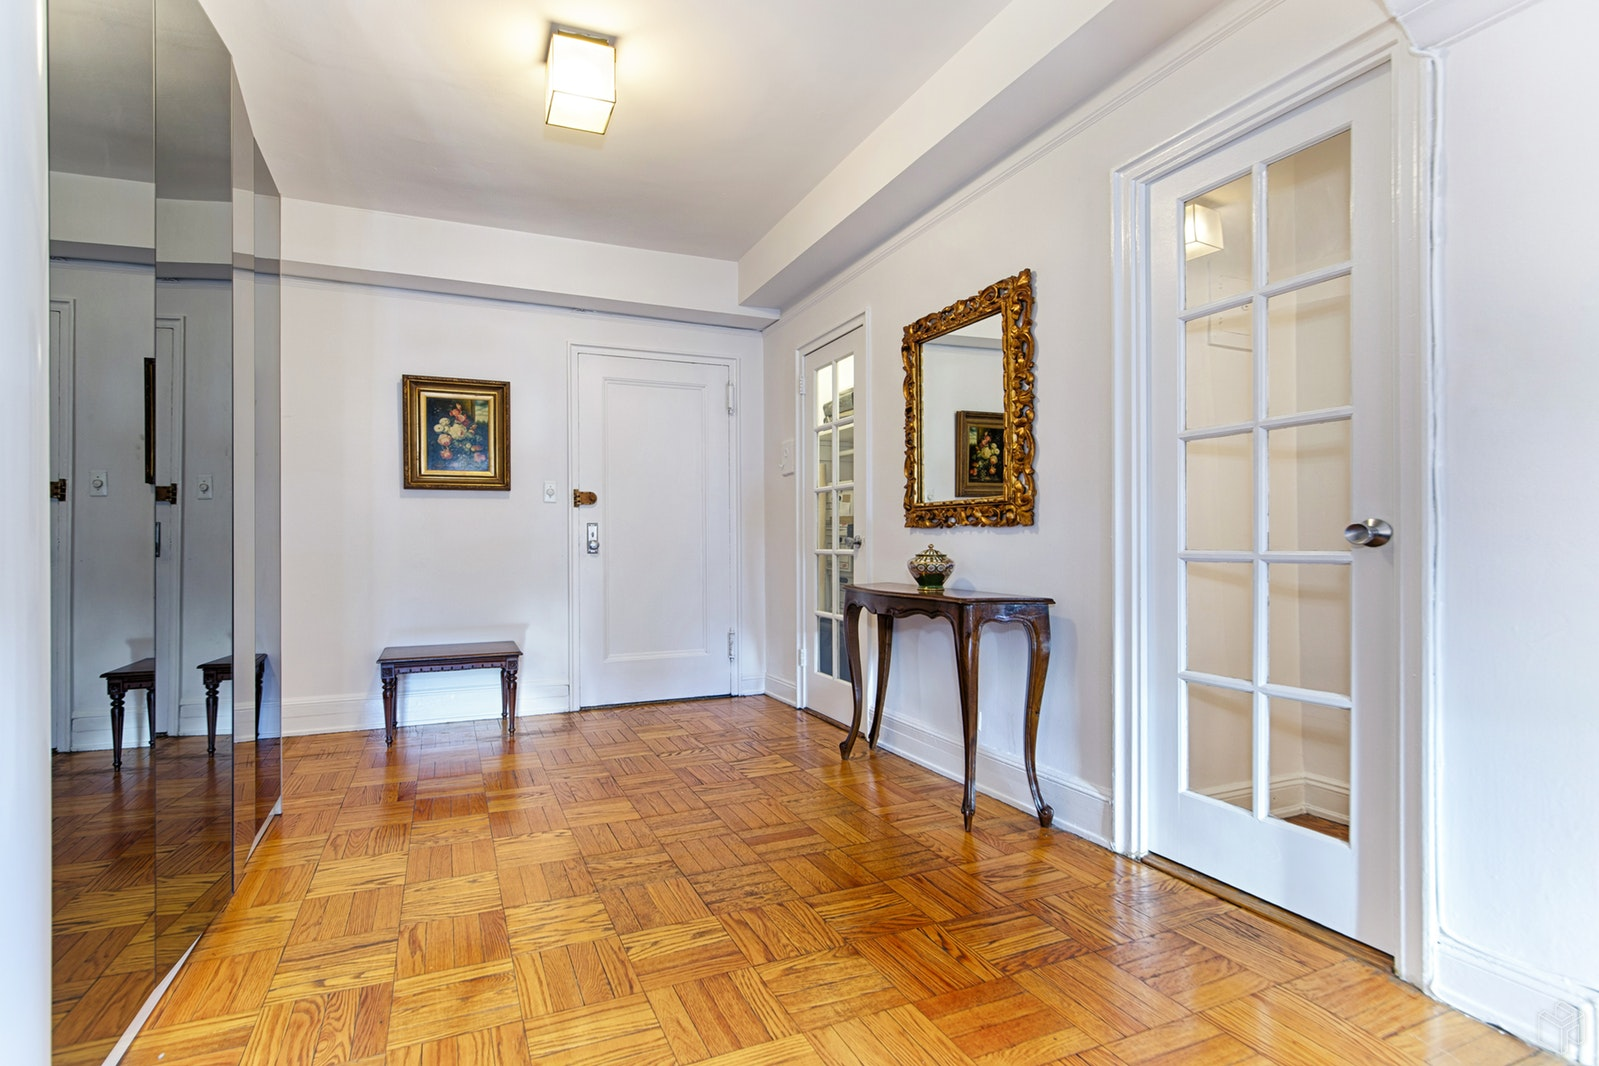 123 EAST 37TH STREET 11D, Murray Hill Kips Bay, $425,000, Web #: 19349727